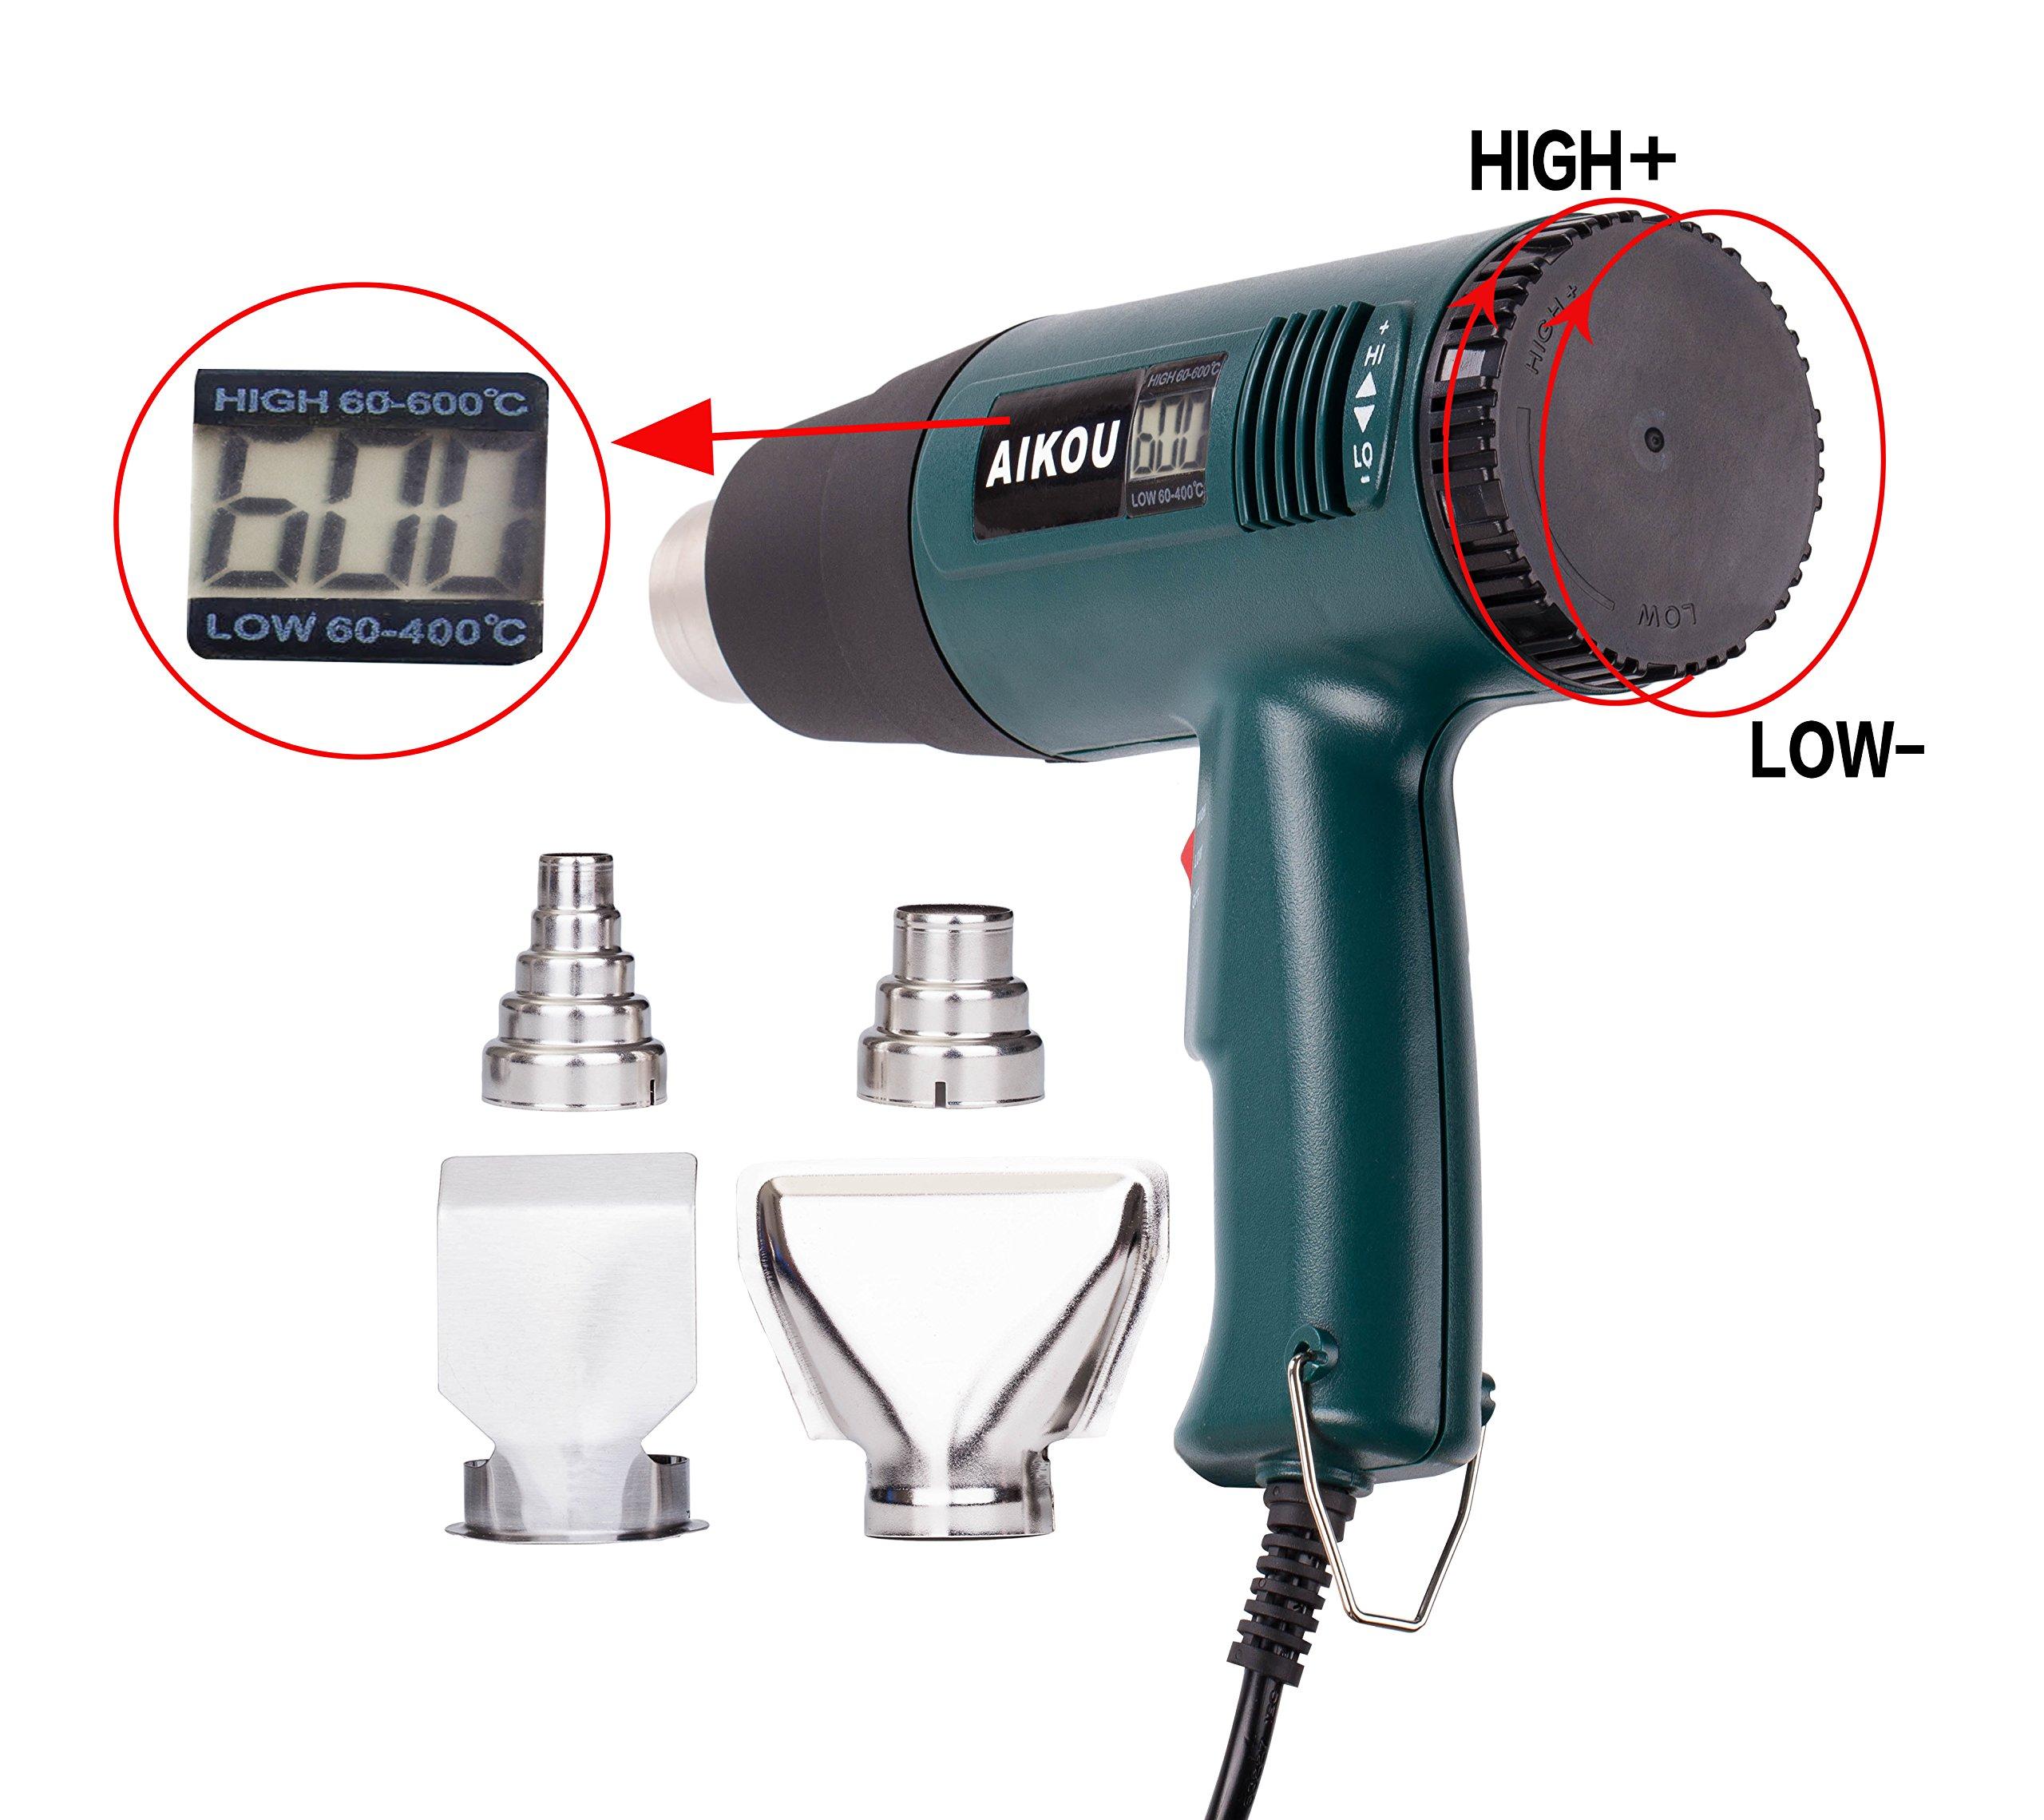 AIKOU 1800W Adjustable Temperature Hot Air Heat Gun with Digital Display Fast Heating Blower Kits (Green)